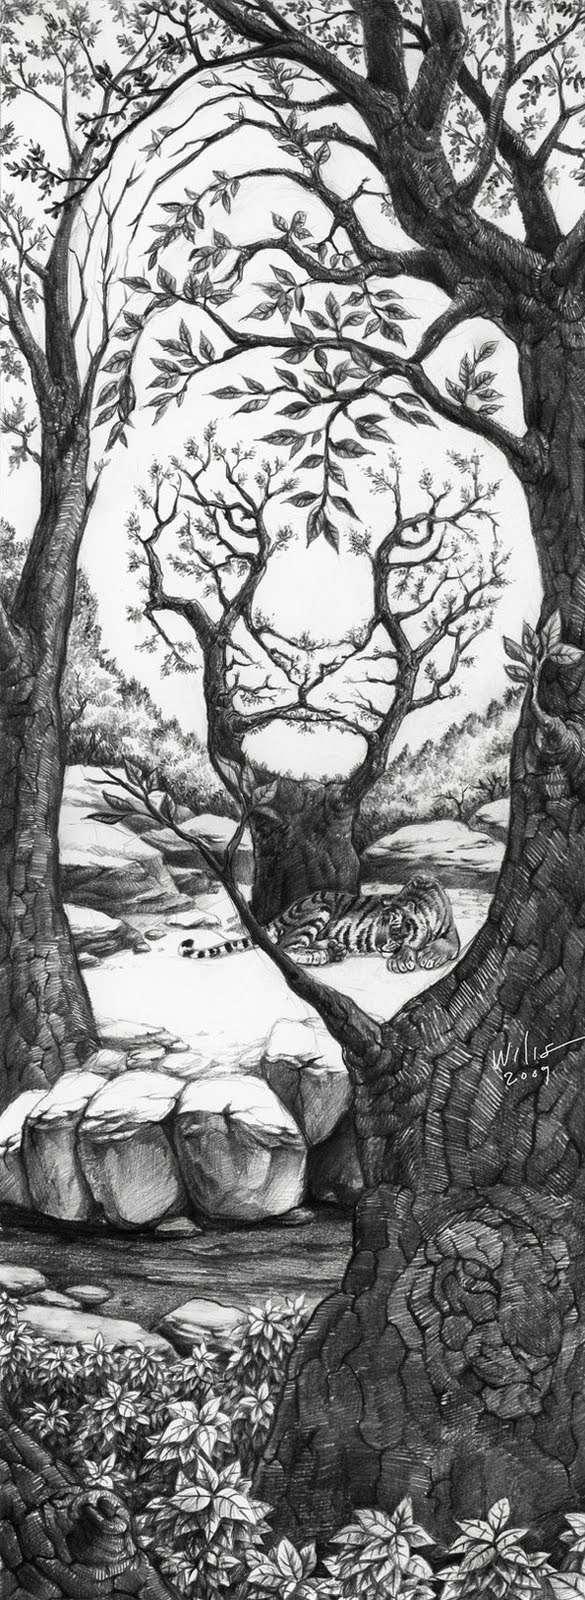 illusion - Page 6 Illus_37